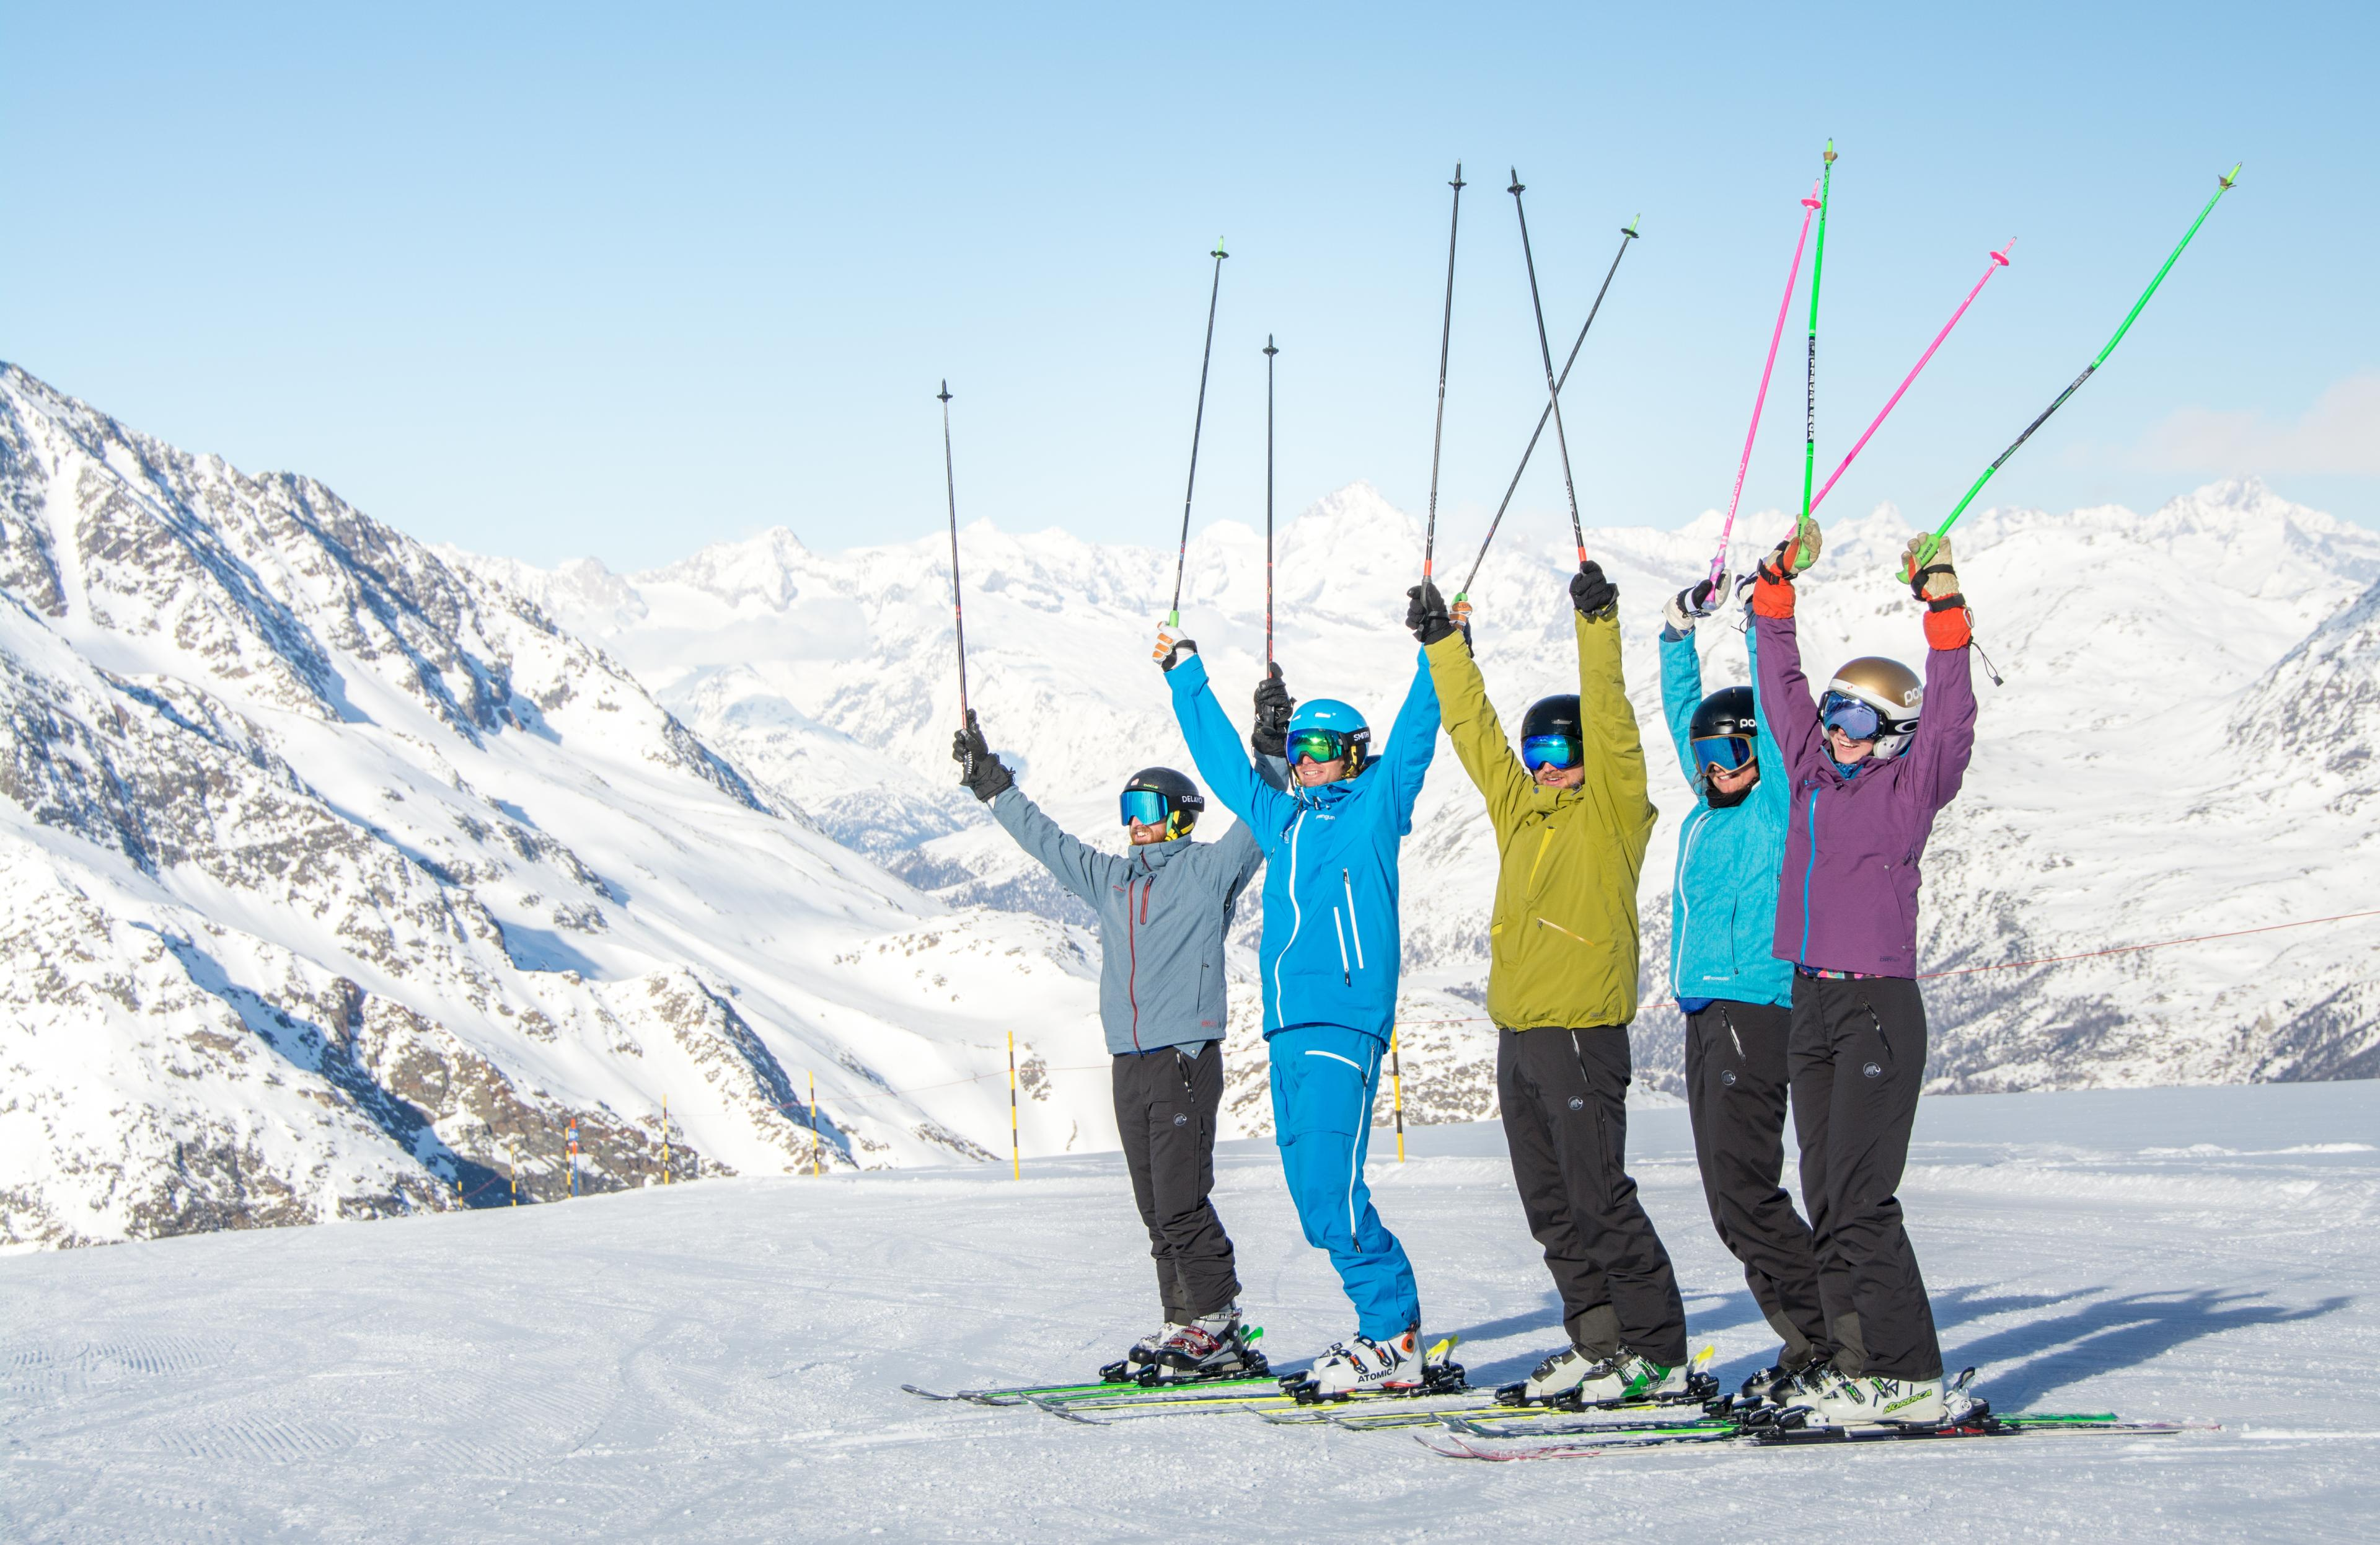 Lezioni di sci per adulti principianti assoluti